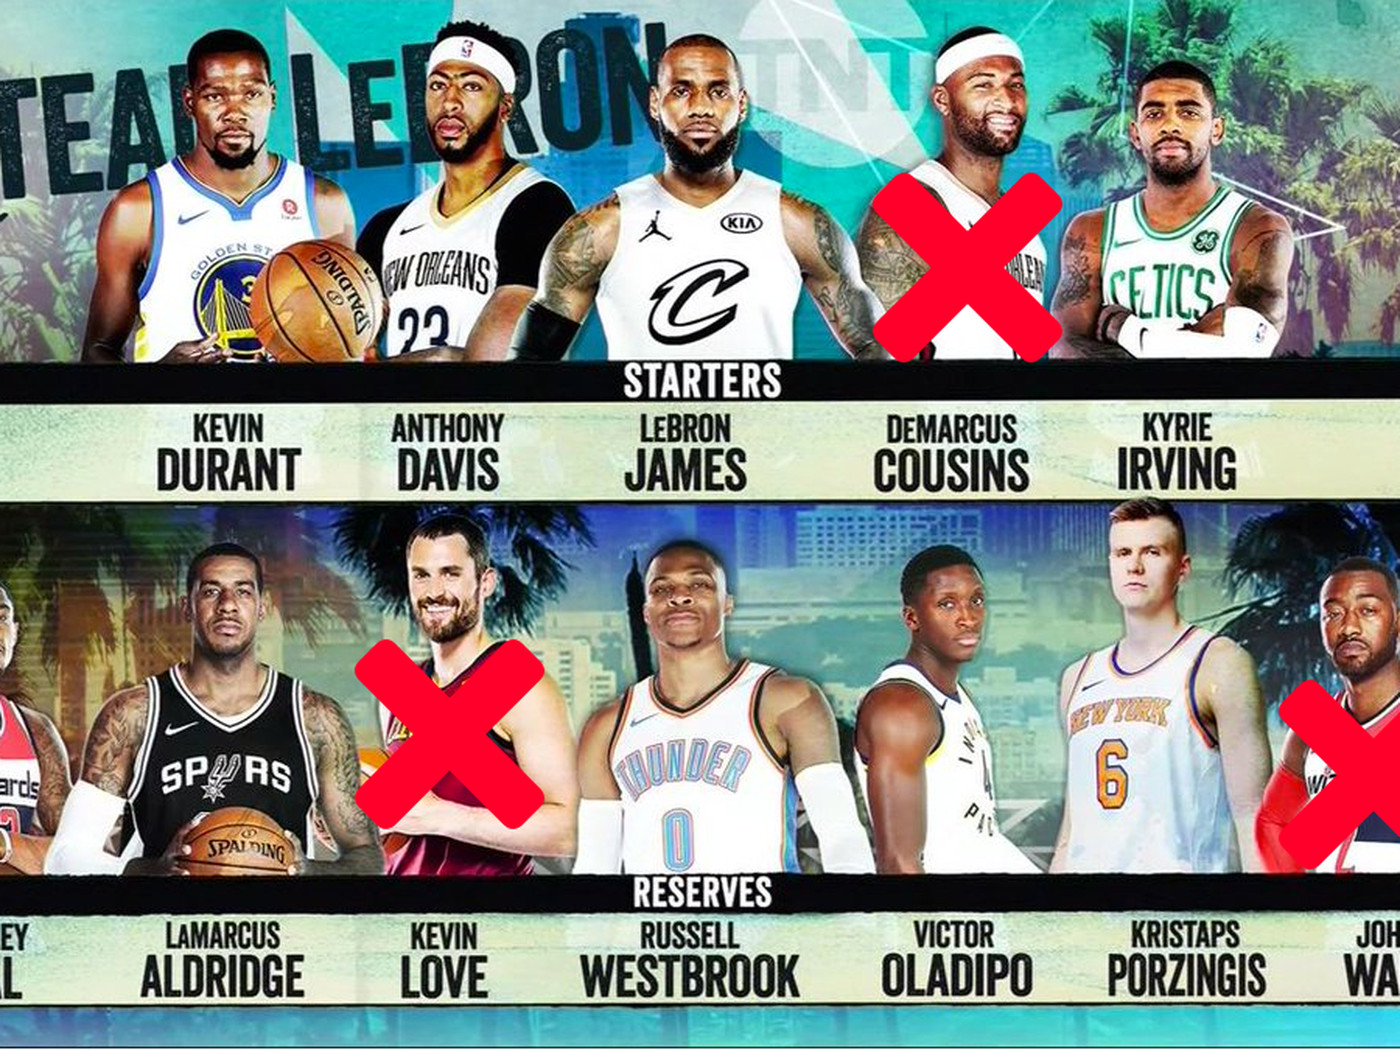 9436ad1c9c2 LeBron James  all-star team might be cursed - SBNation.com